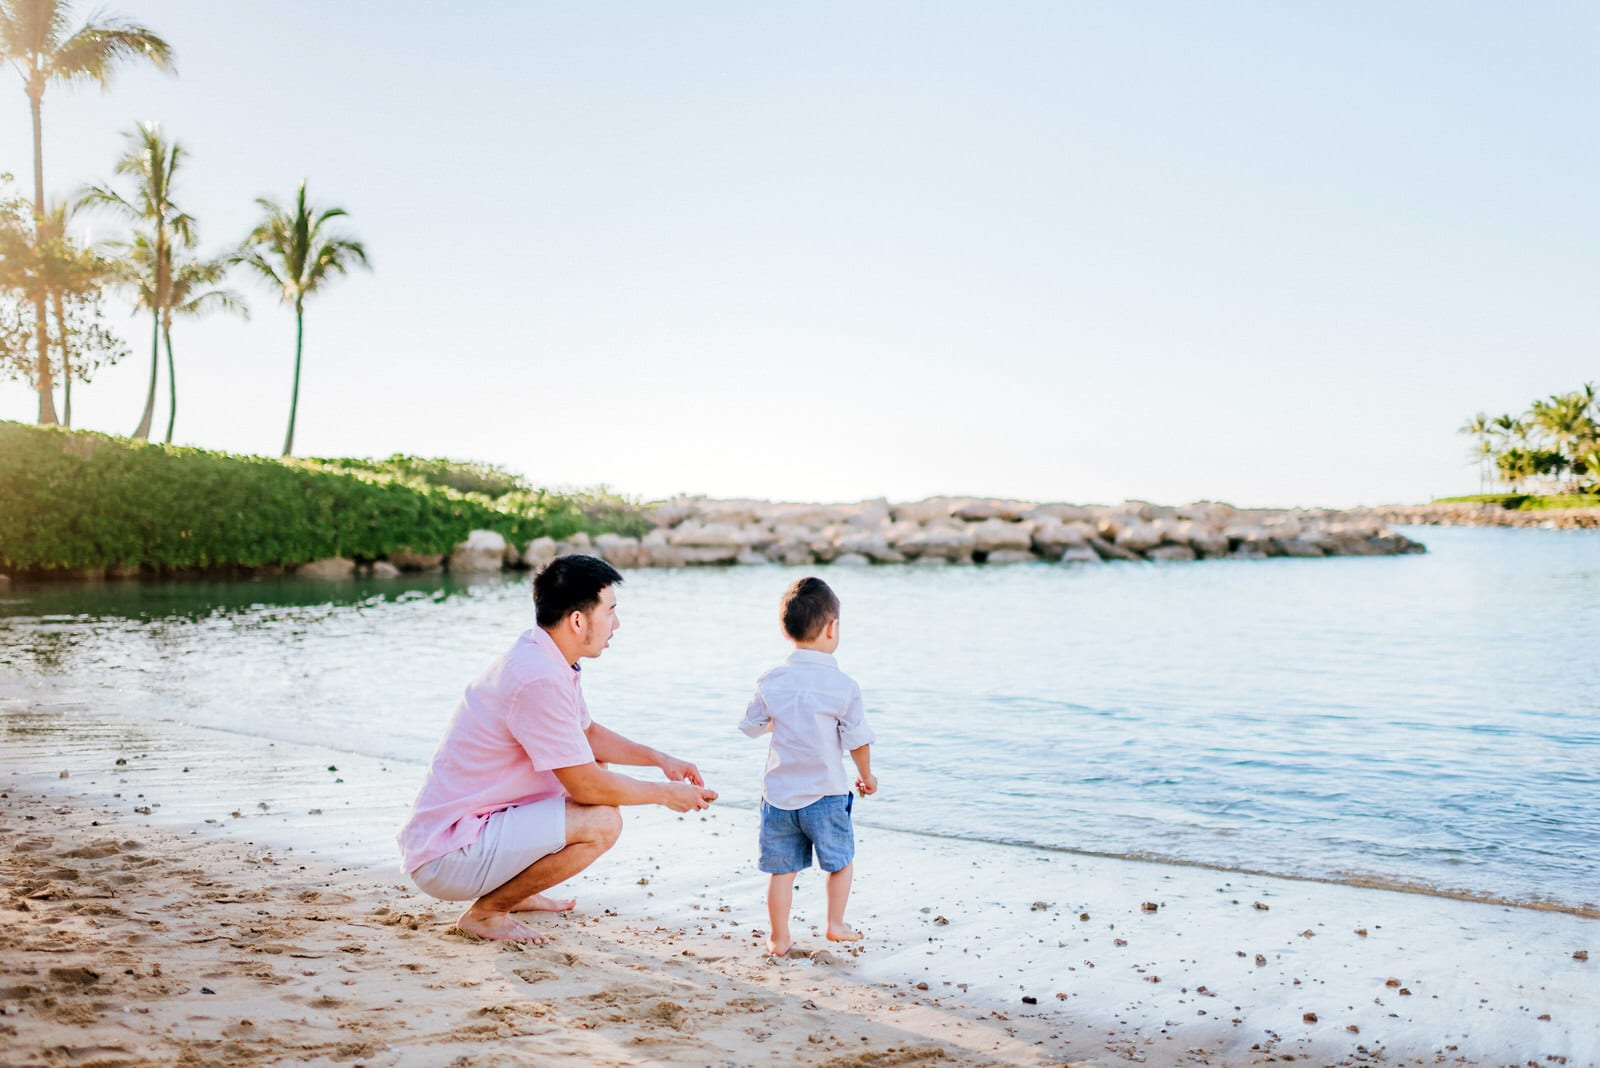 oahu-photographer-family-aulani-resort-11.jpg